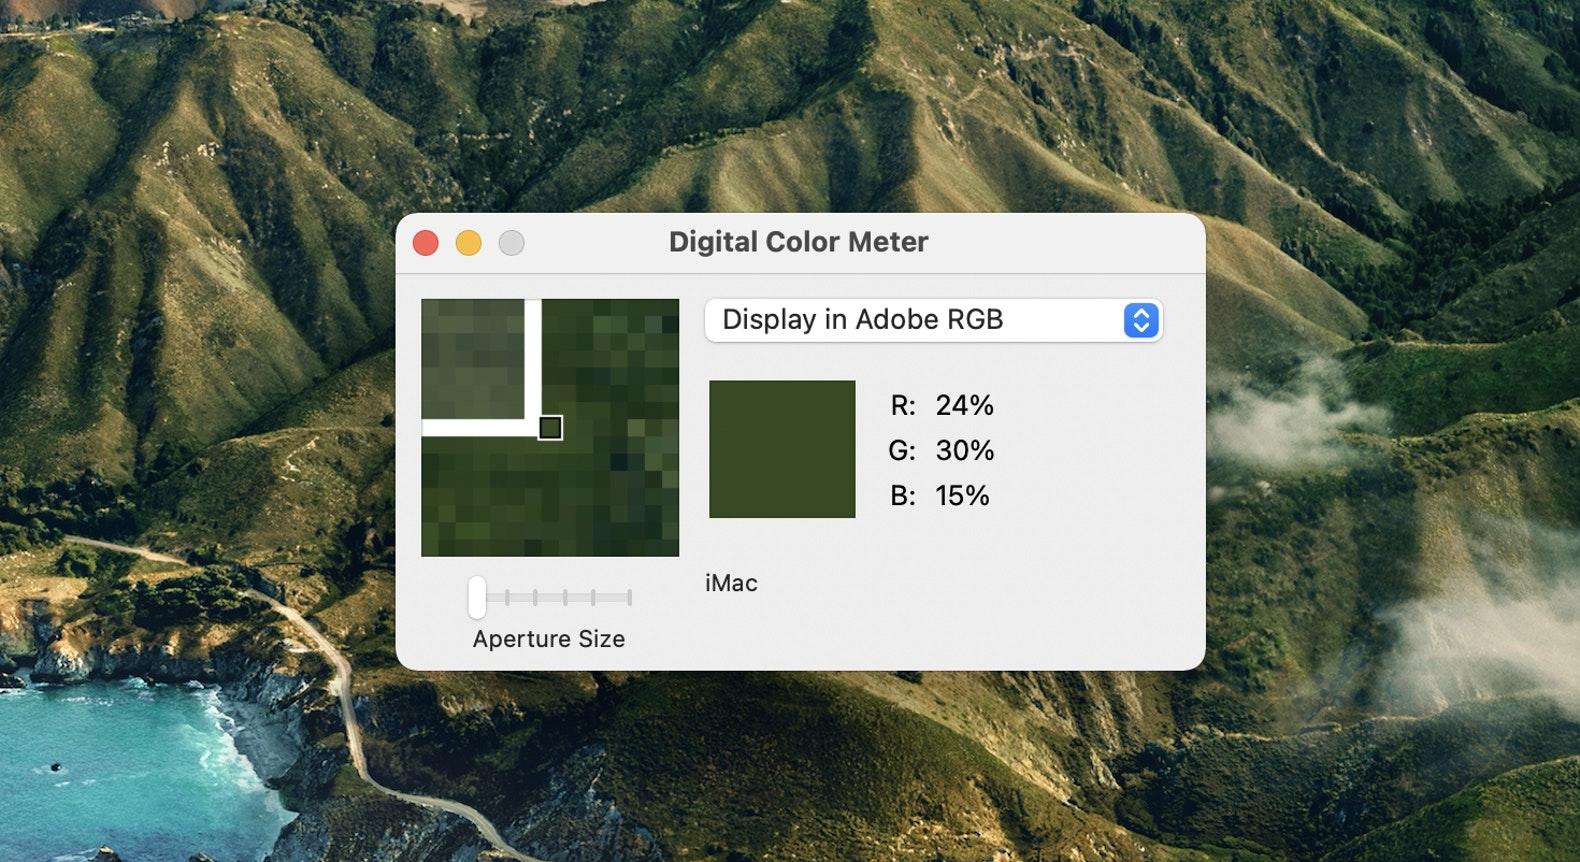 Digital Color Meter